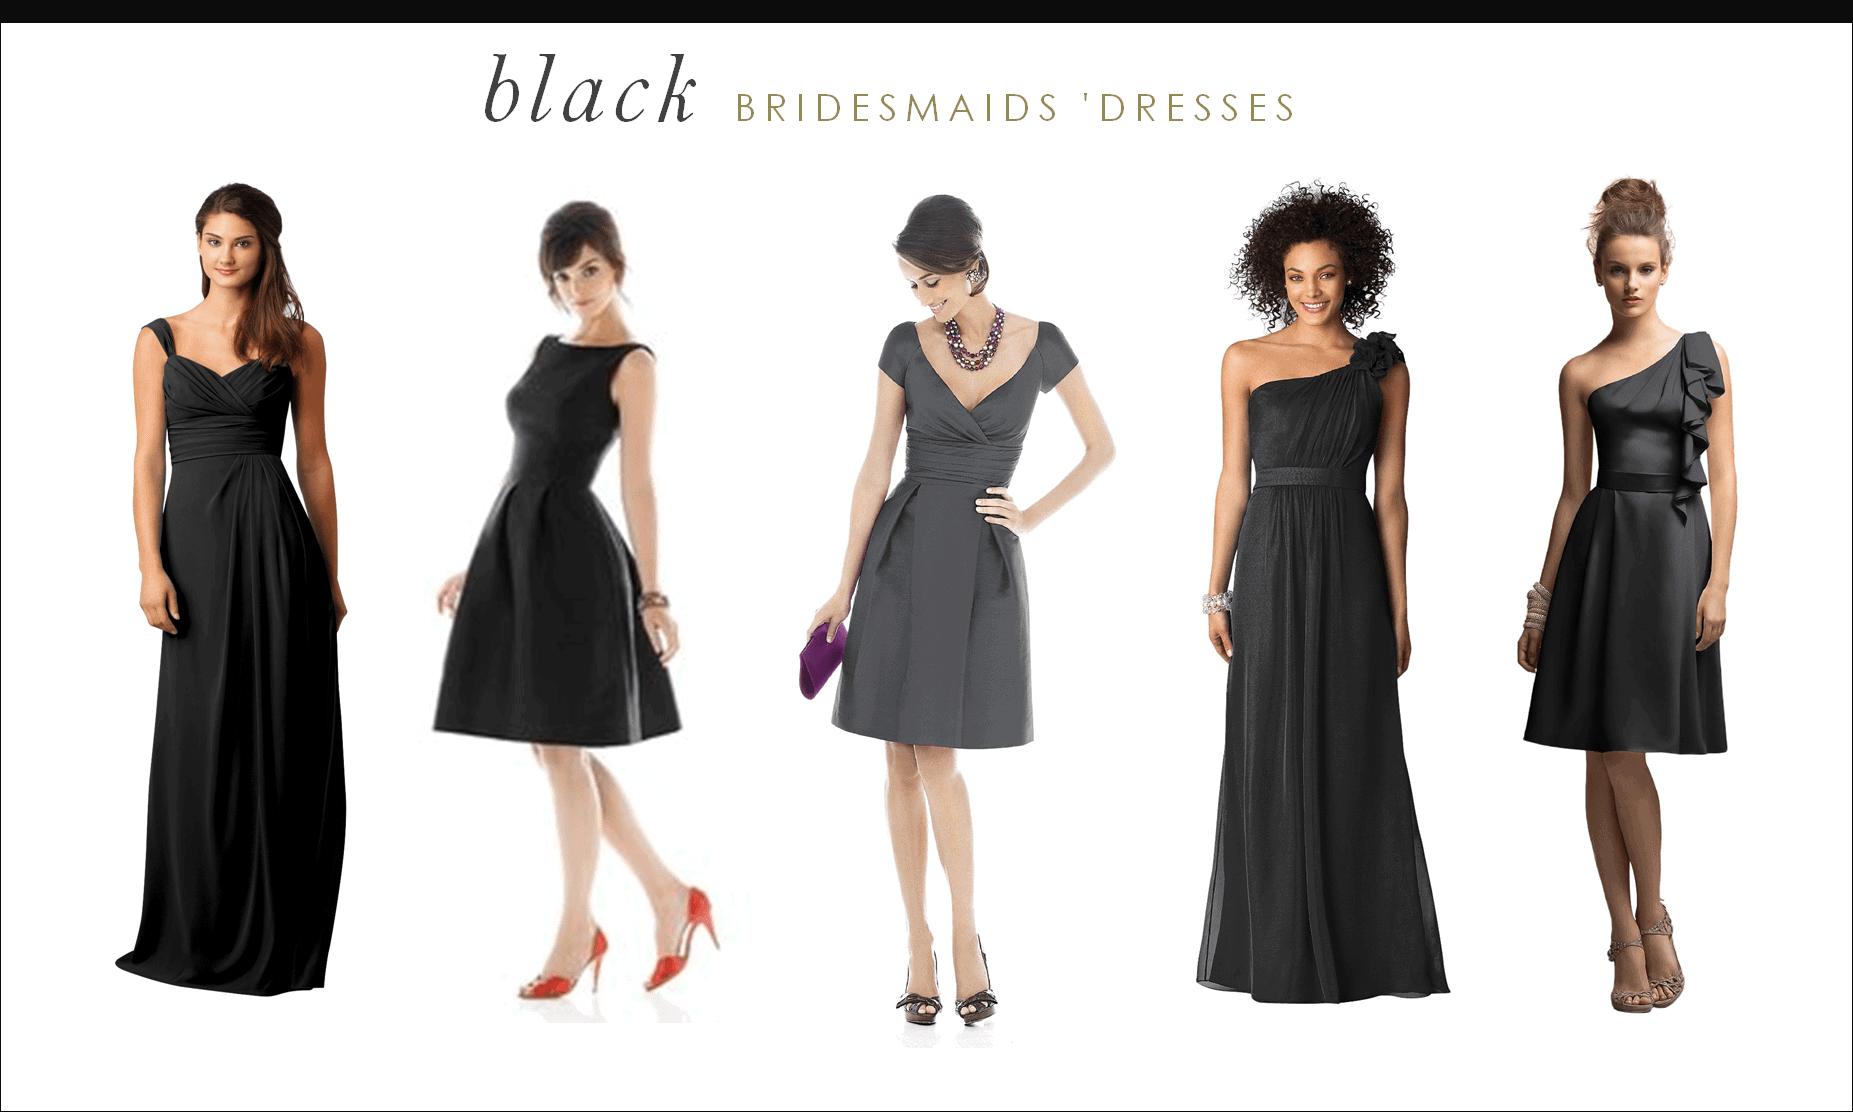 Reader request black bridesmaids dresses for Weddings with black bridesmaid dresses